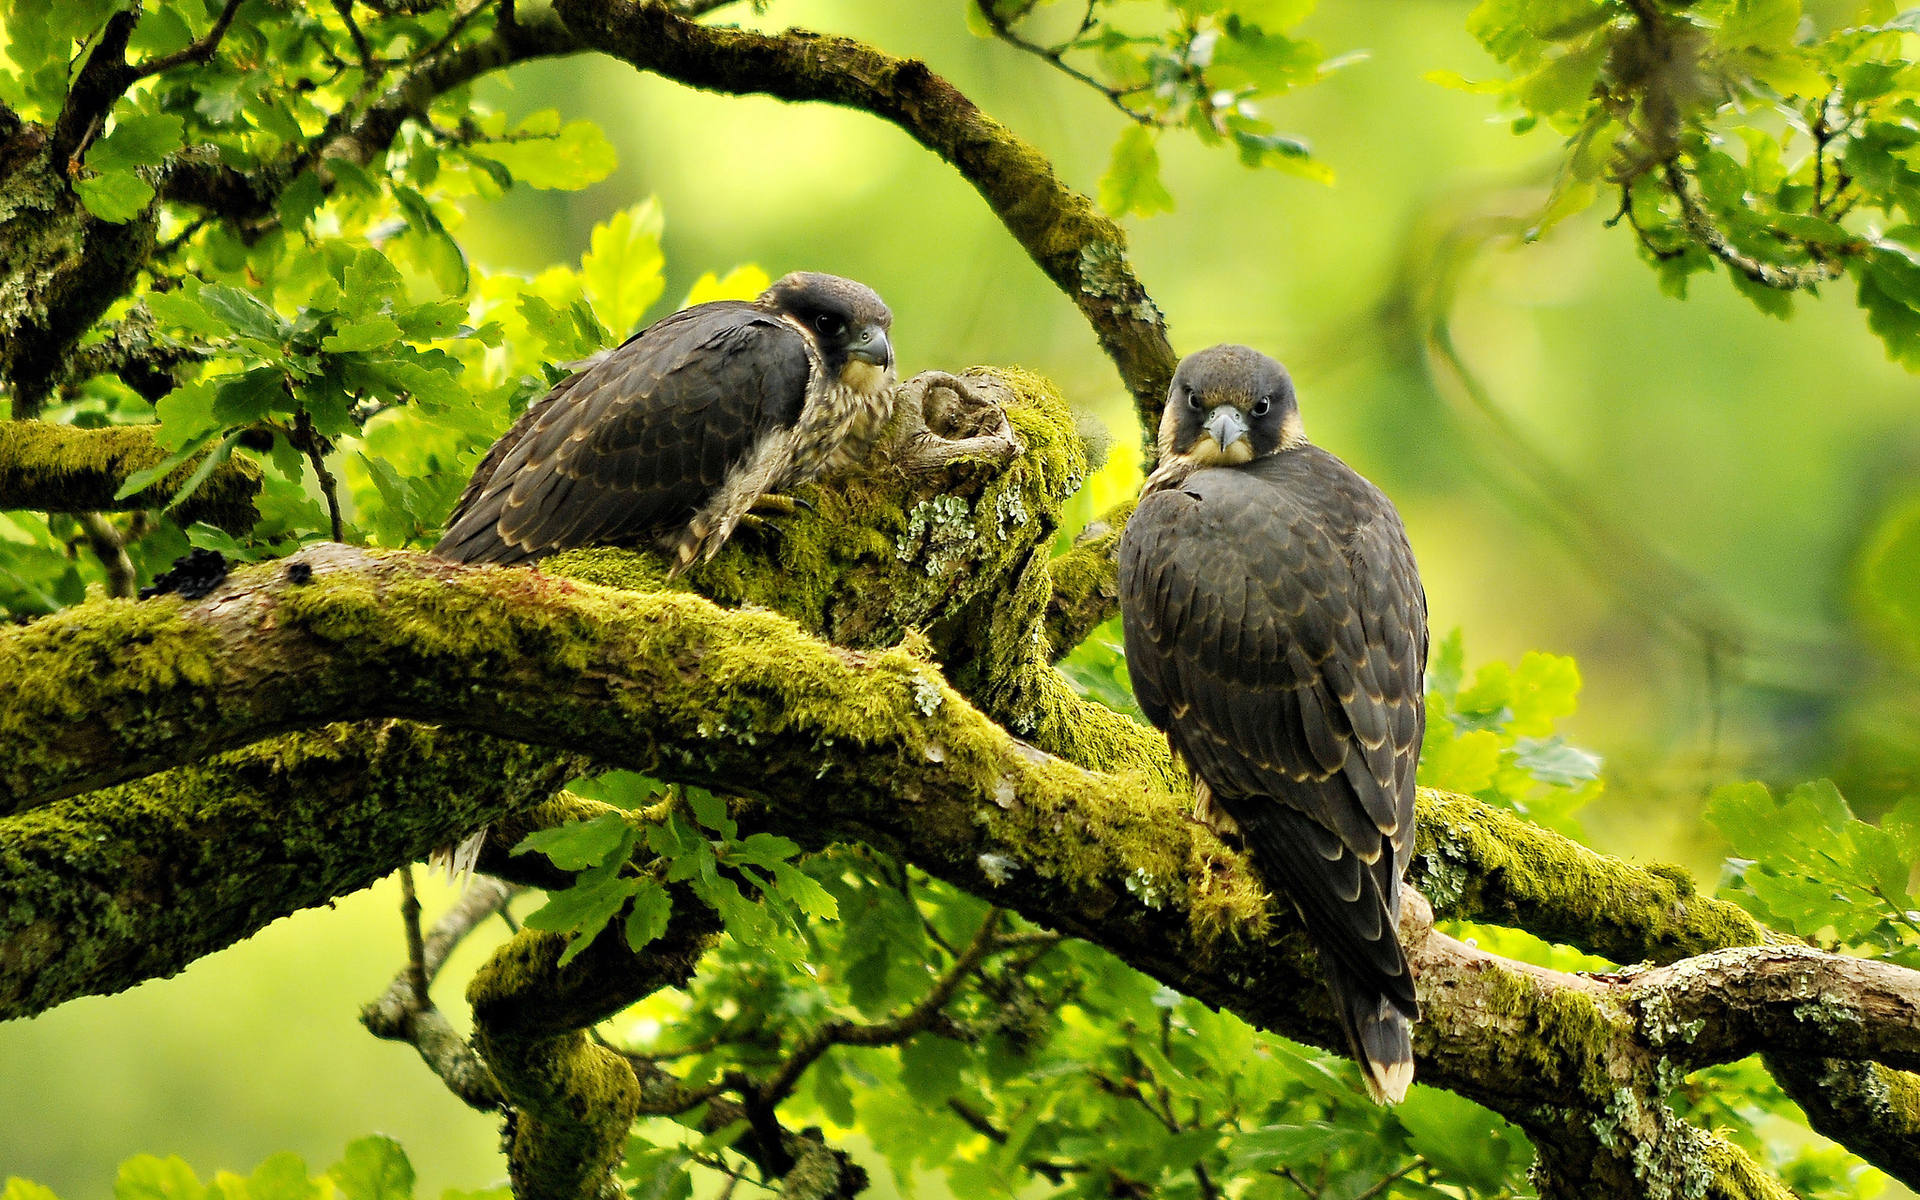 Falcon Animals Birds Raptor Predator Trees Forest Green